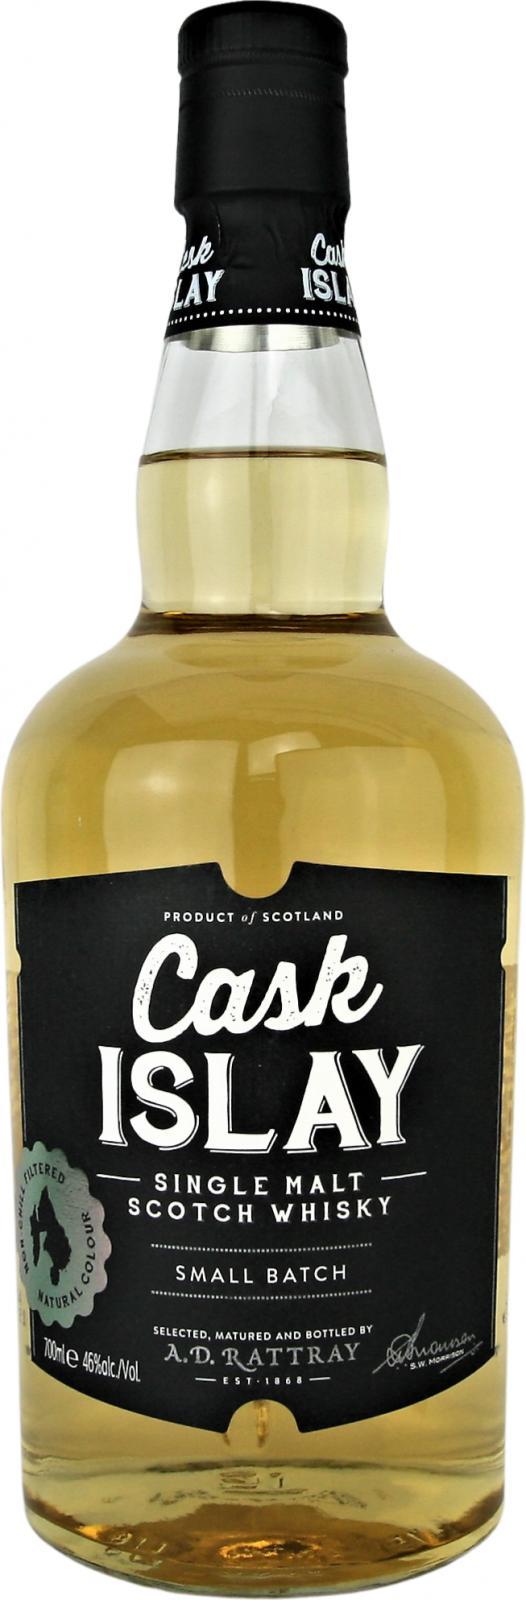 Cask Islay NAS DR